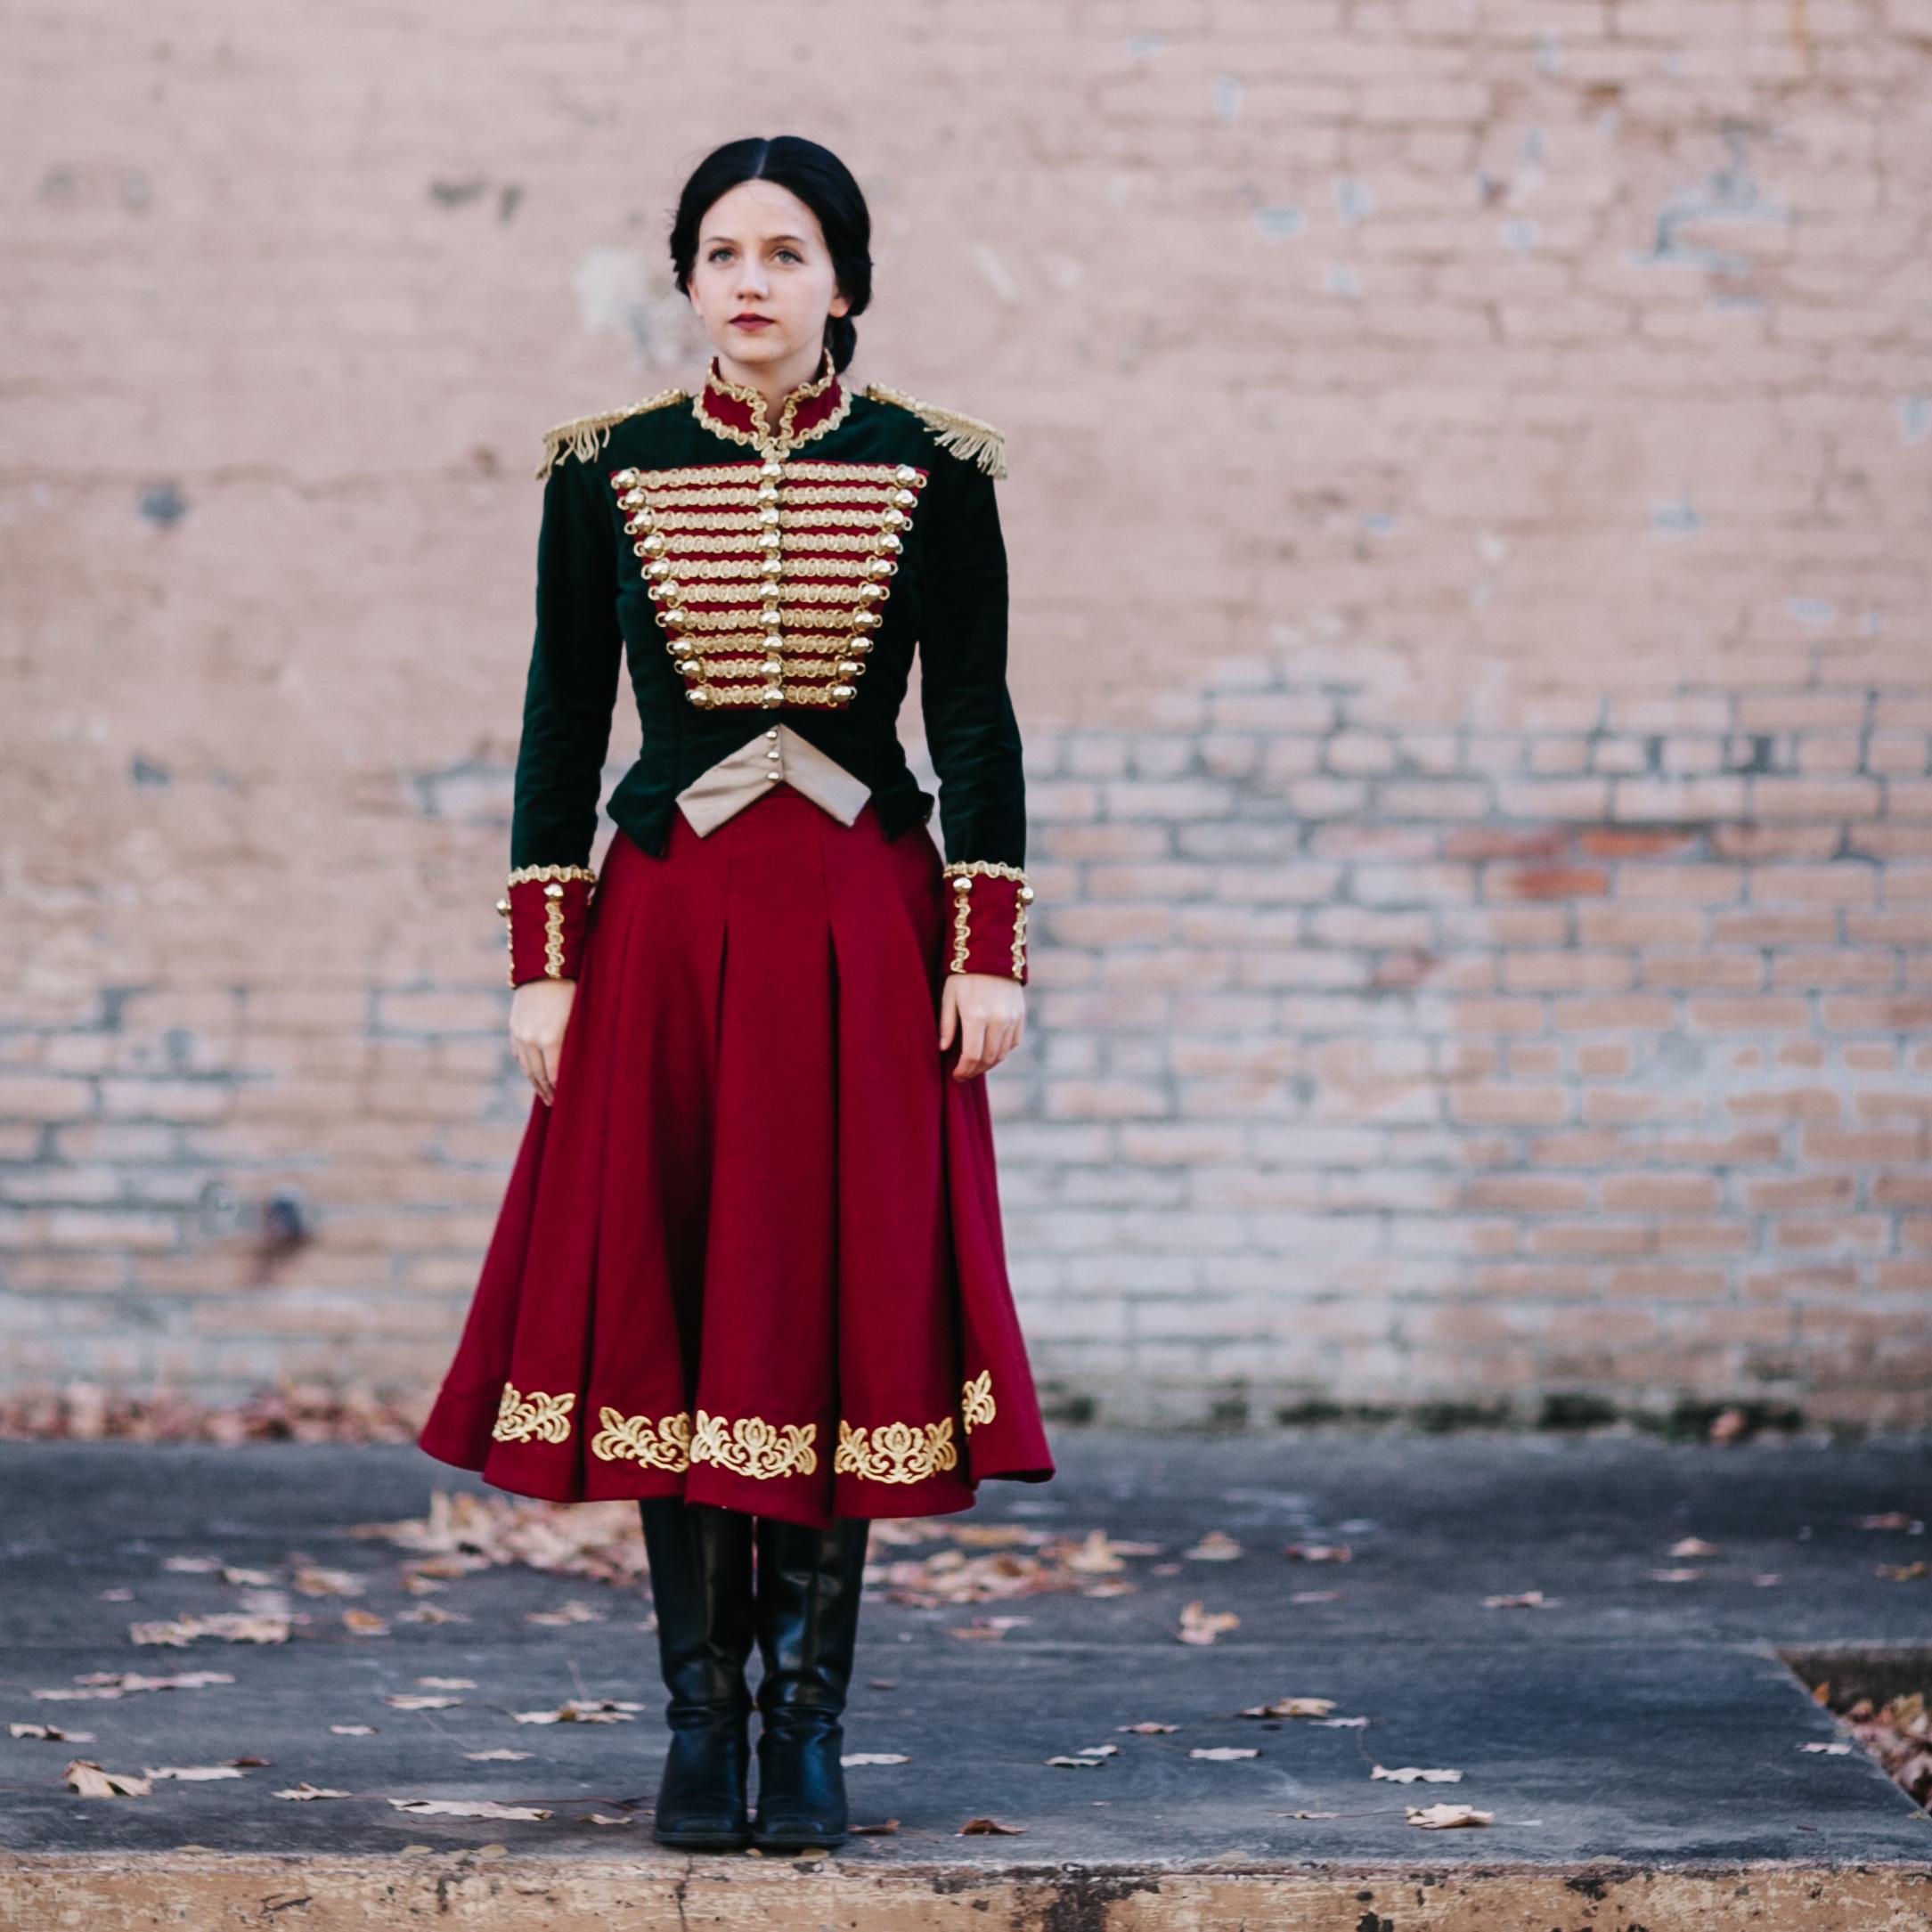 Clara's Nutcracker Outfit